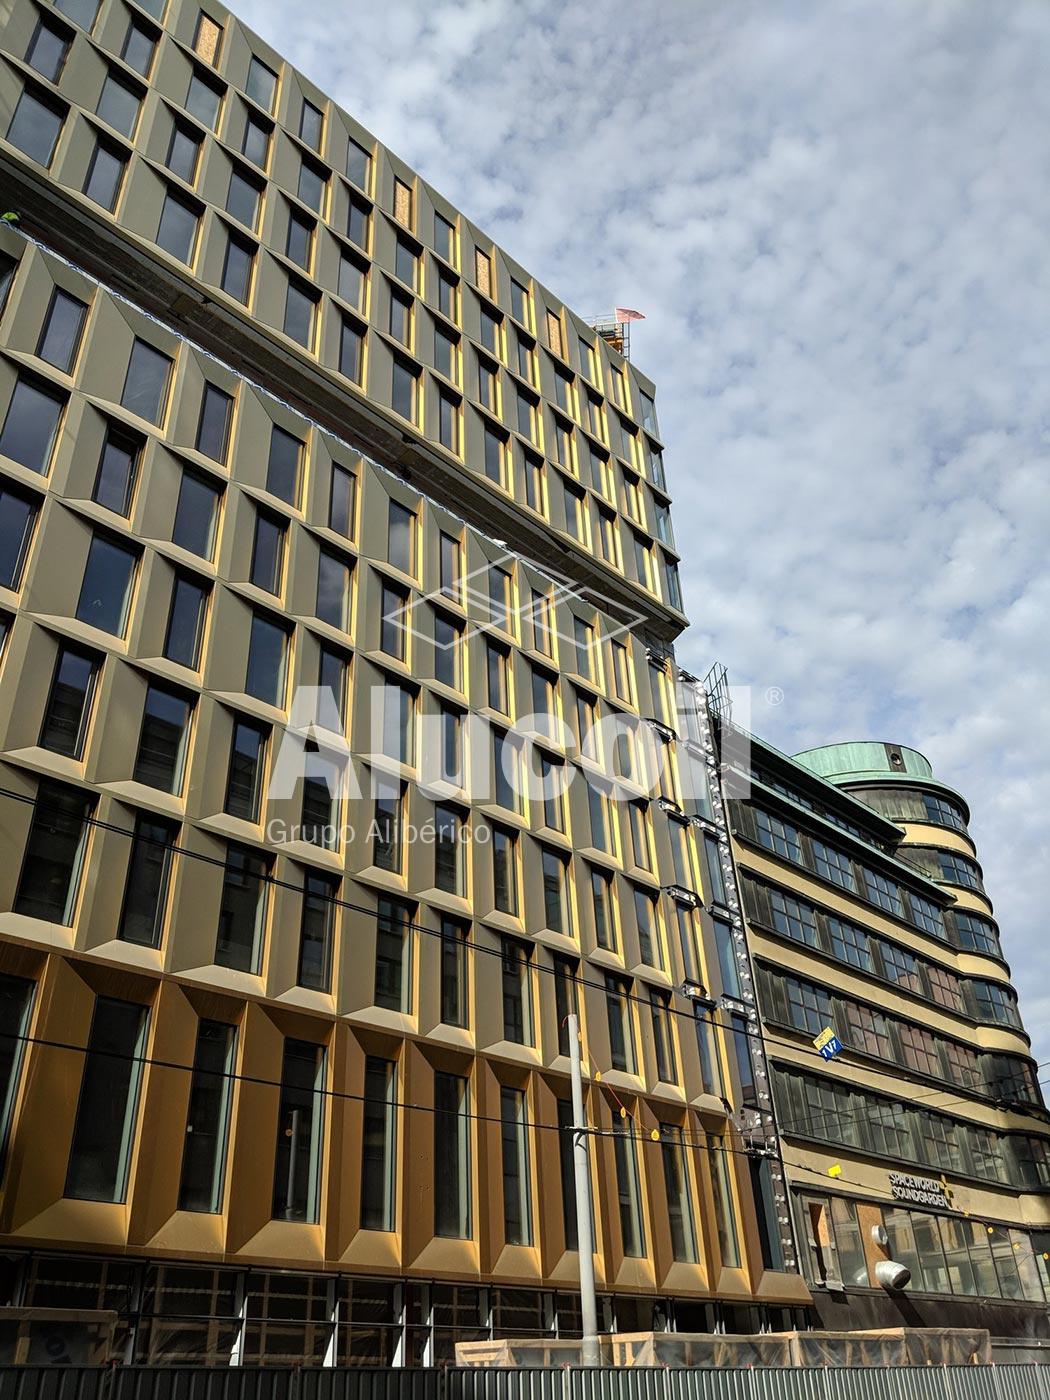 Royal Hotel the Hub